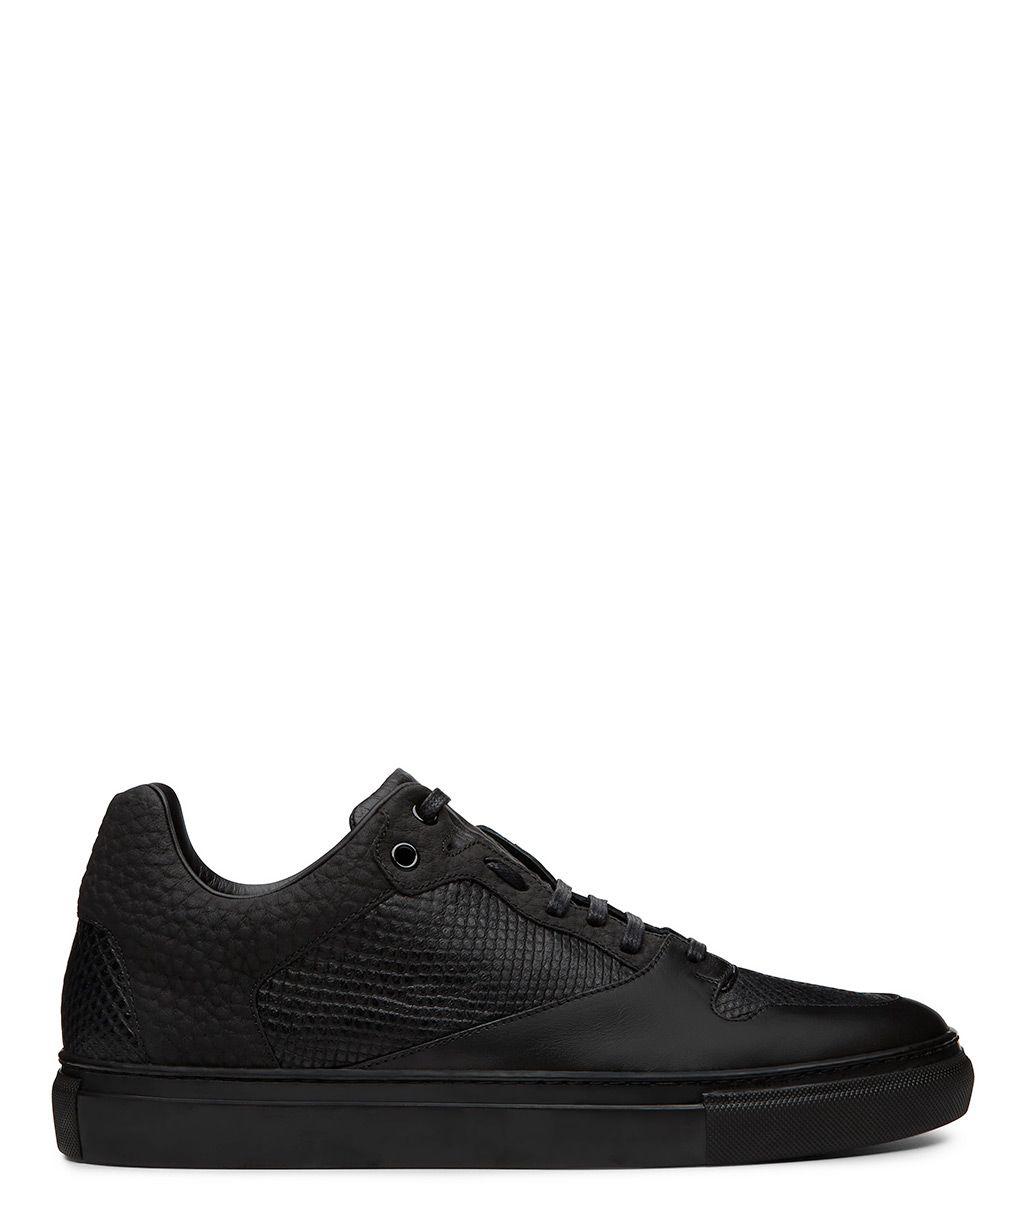 edcbf16f09e1 Balenciaga Black Low Top Sneaker